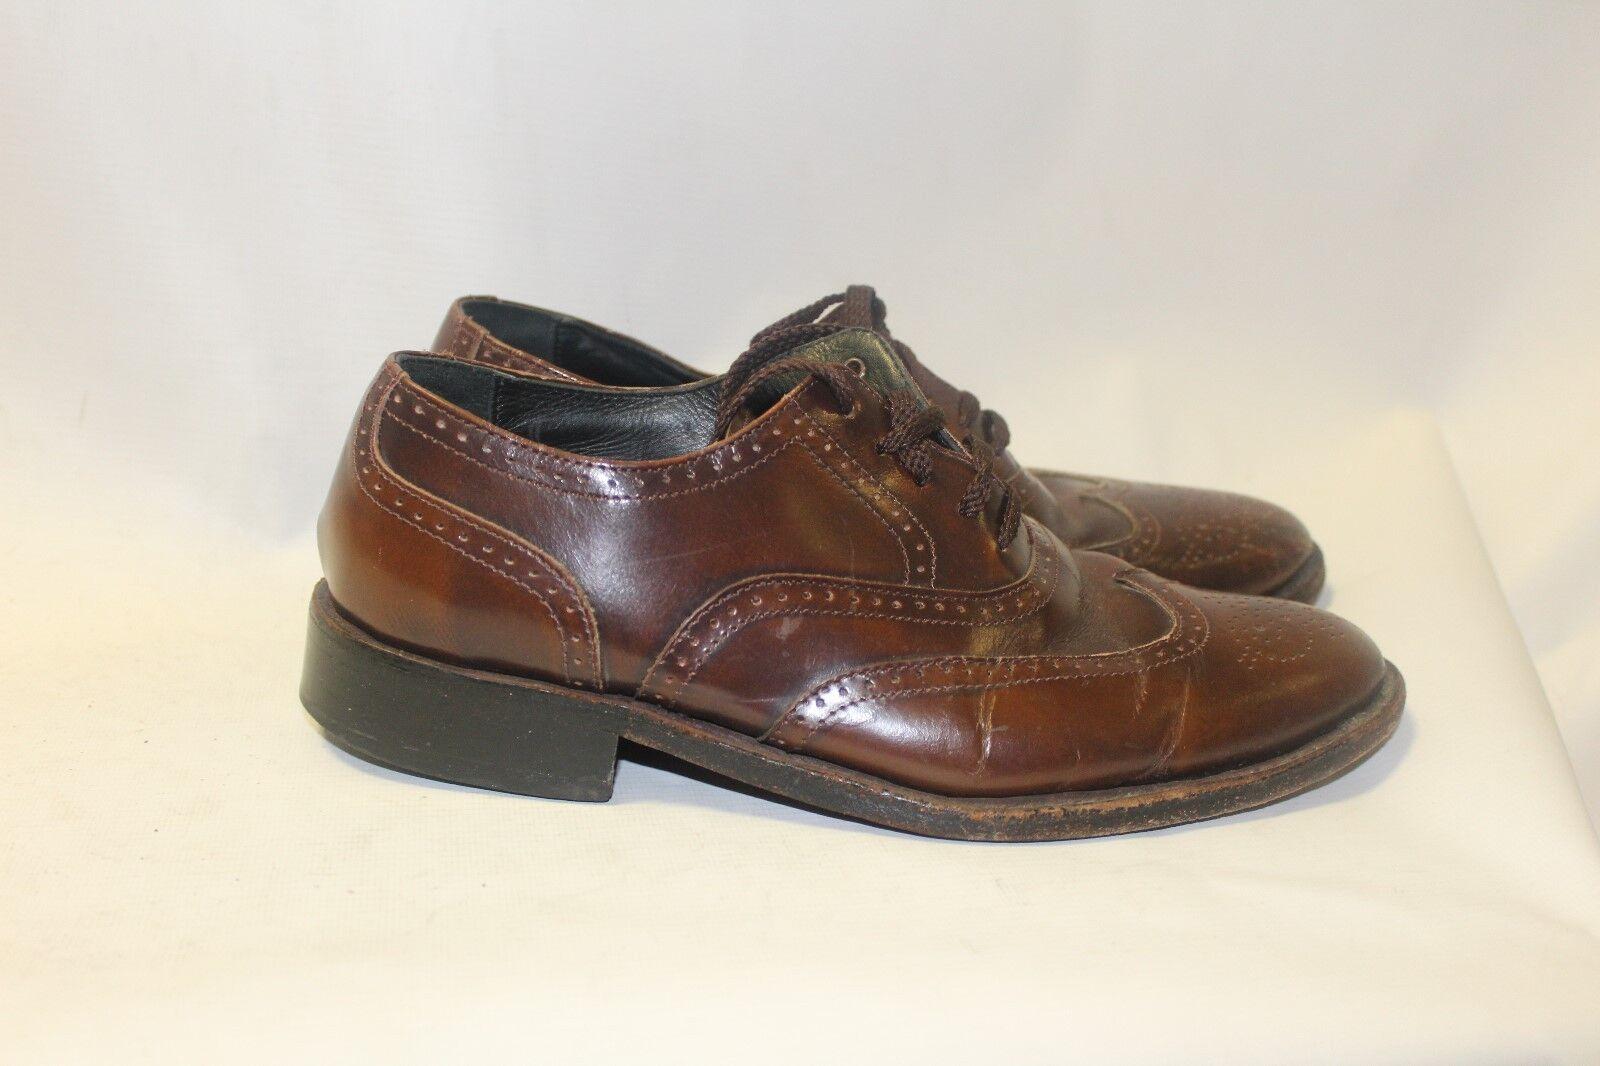 Uomo Braun Leder Samuel Windsor Brogues Brogues Brogues Größe 7 Formal Schuhes Wedding 6b1b51